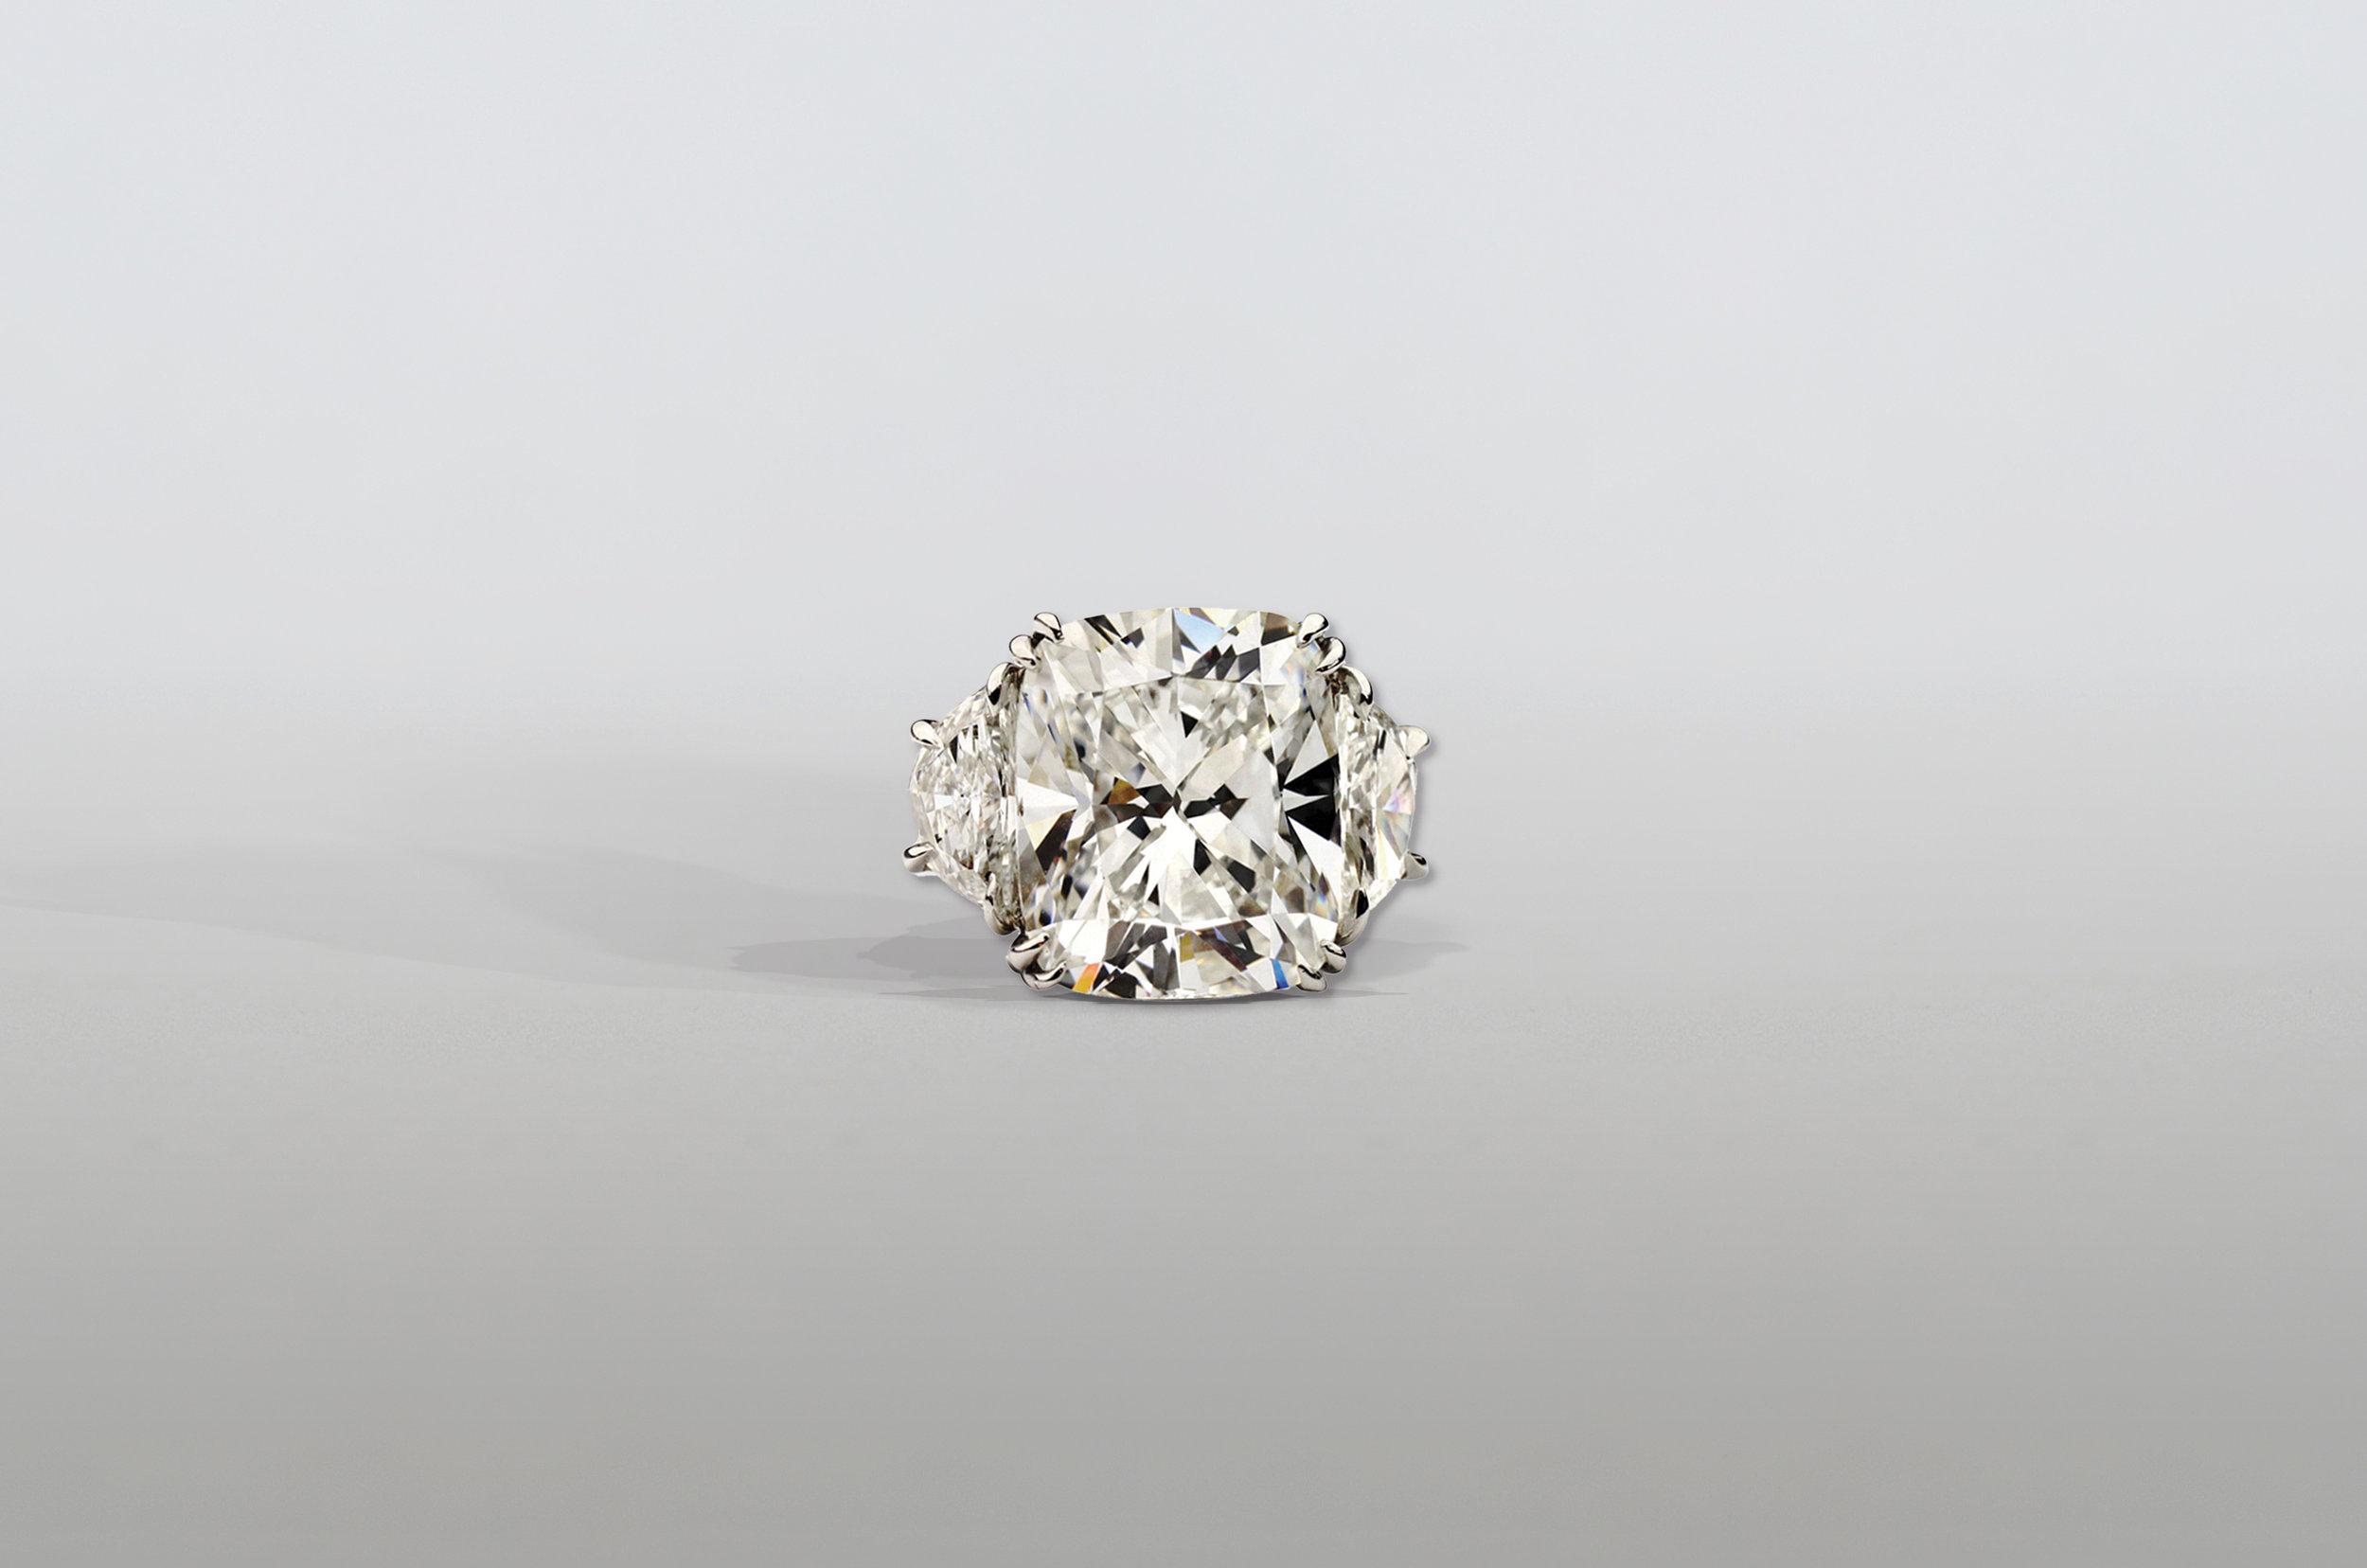 6 Carat Radiant Cushion Diamond Ring with Shield Diamonds set in Platinum